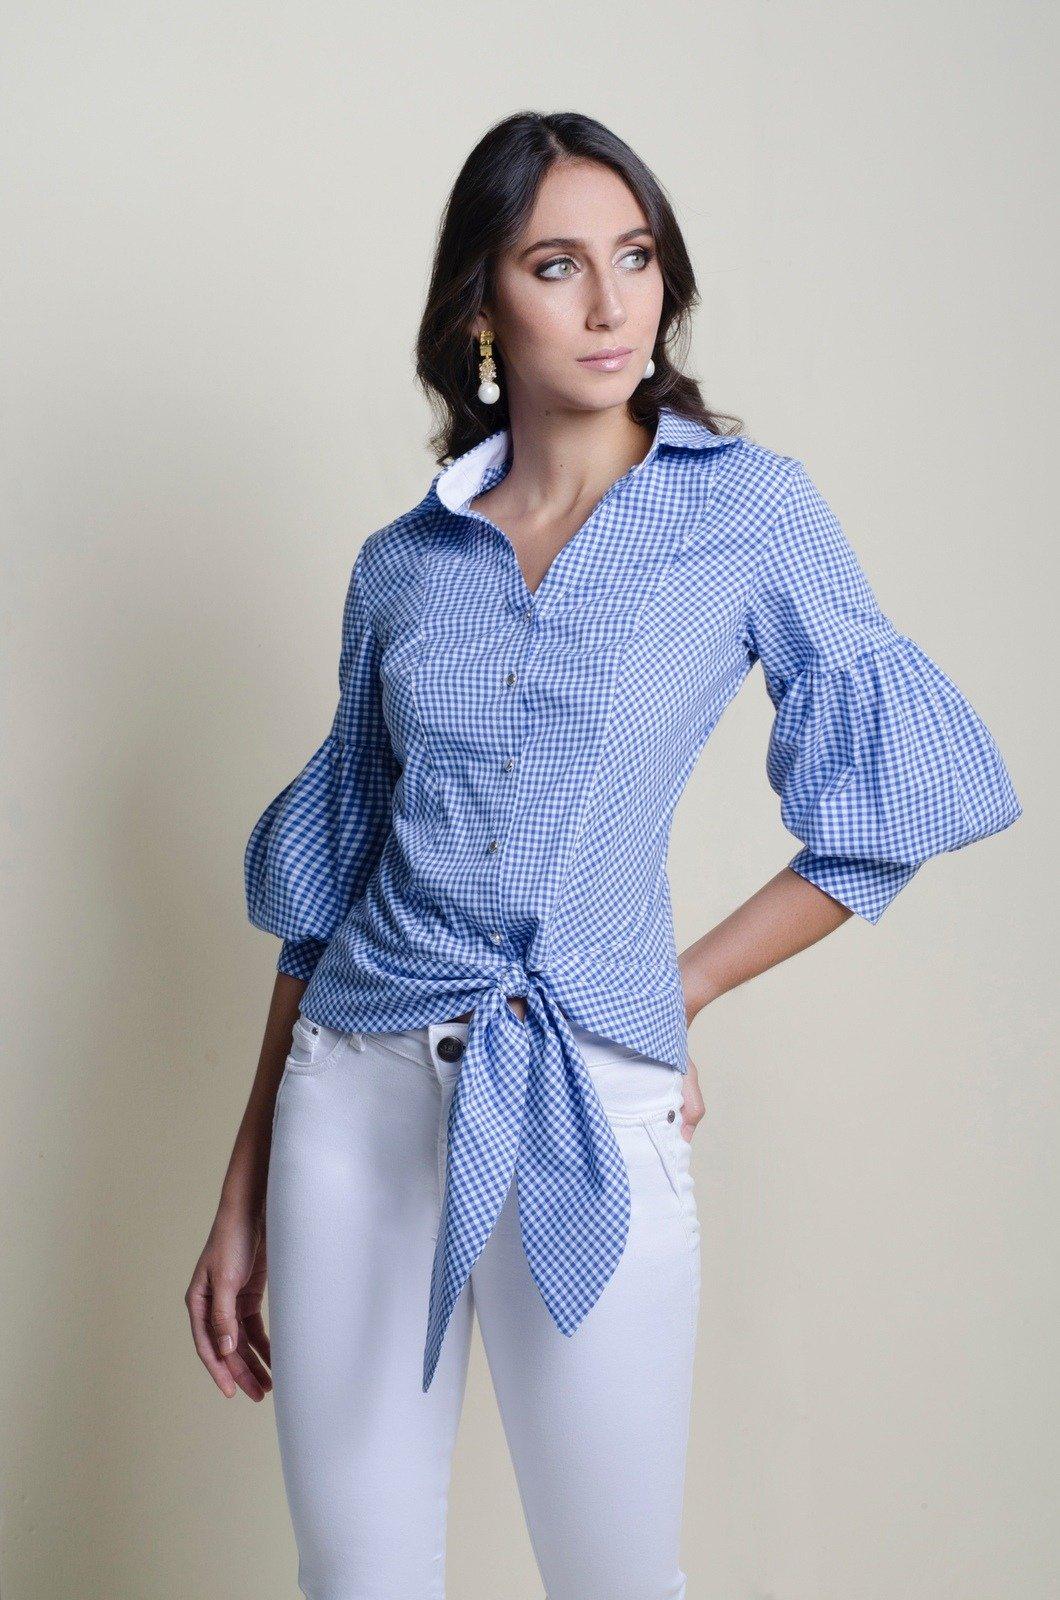 Blusa camisera con nudo de amarrar - Chazari 4058-20 C